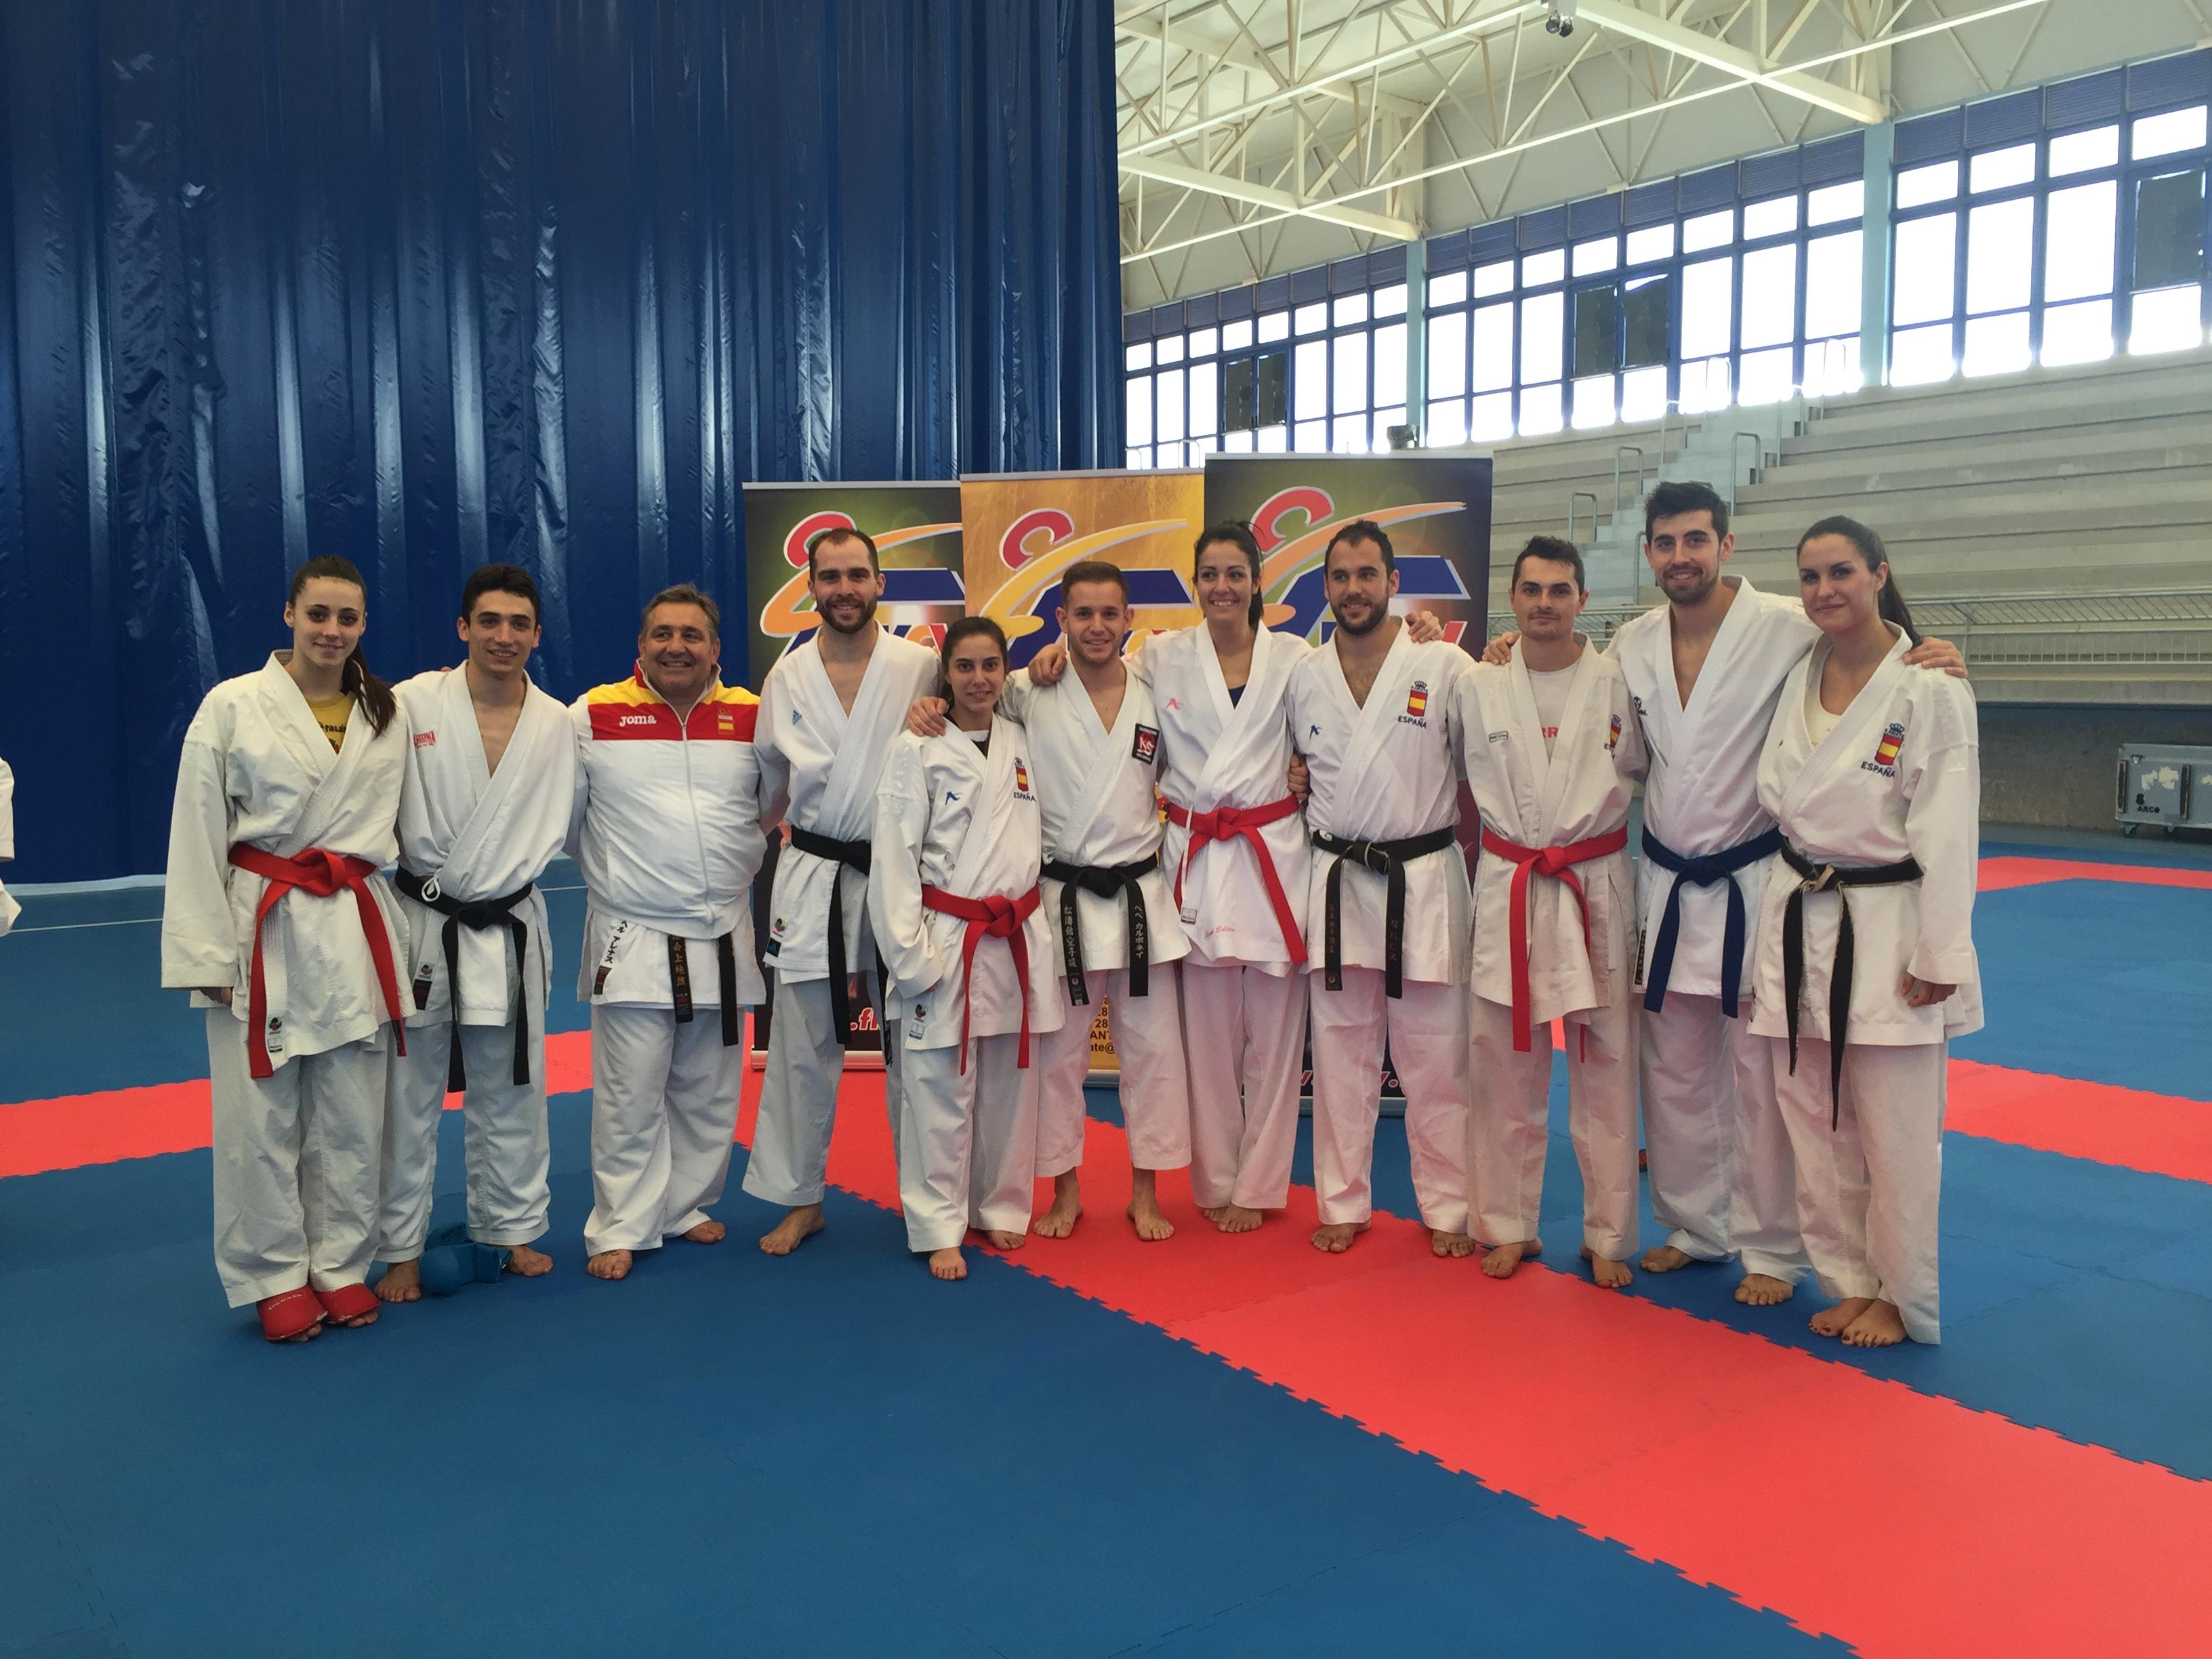 Training Camp Cheste 2015